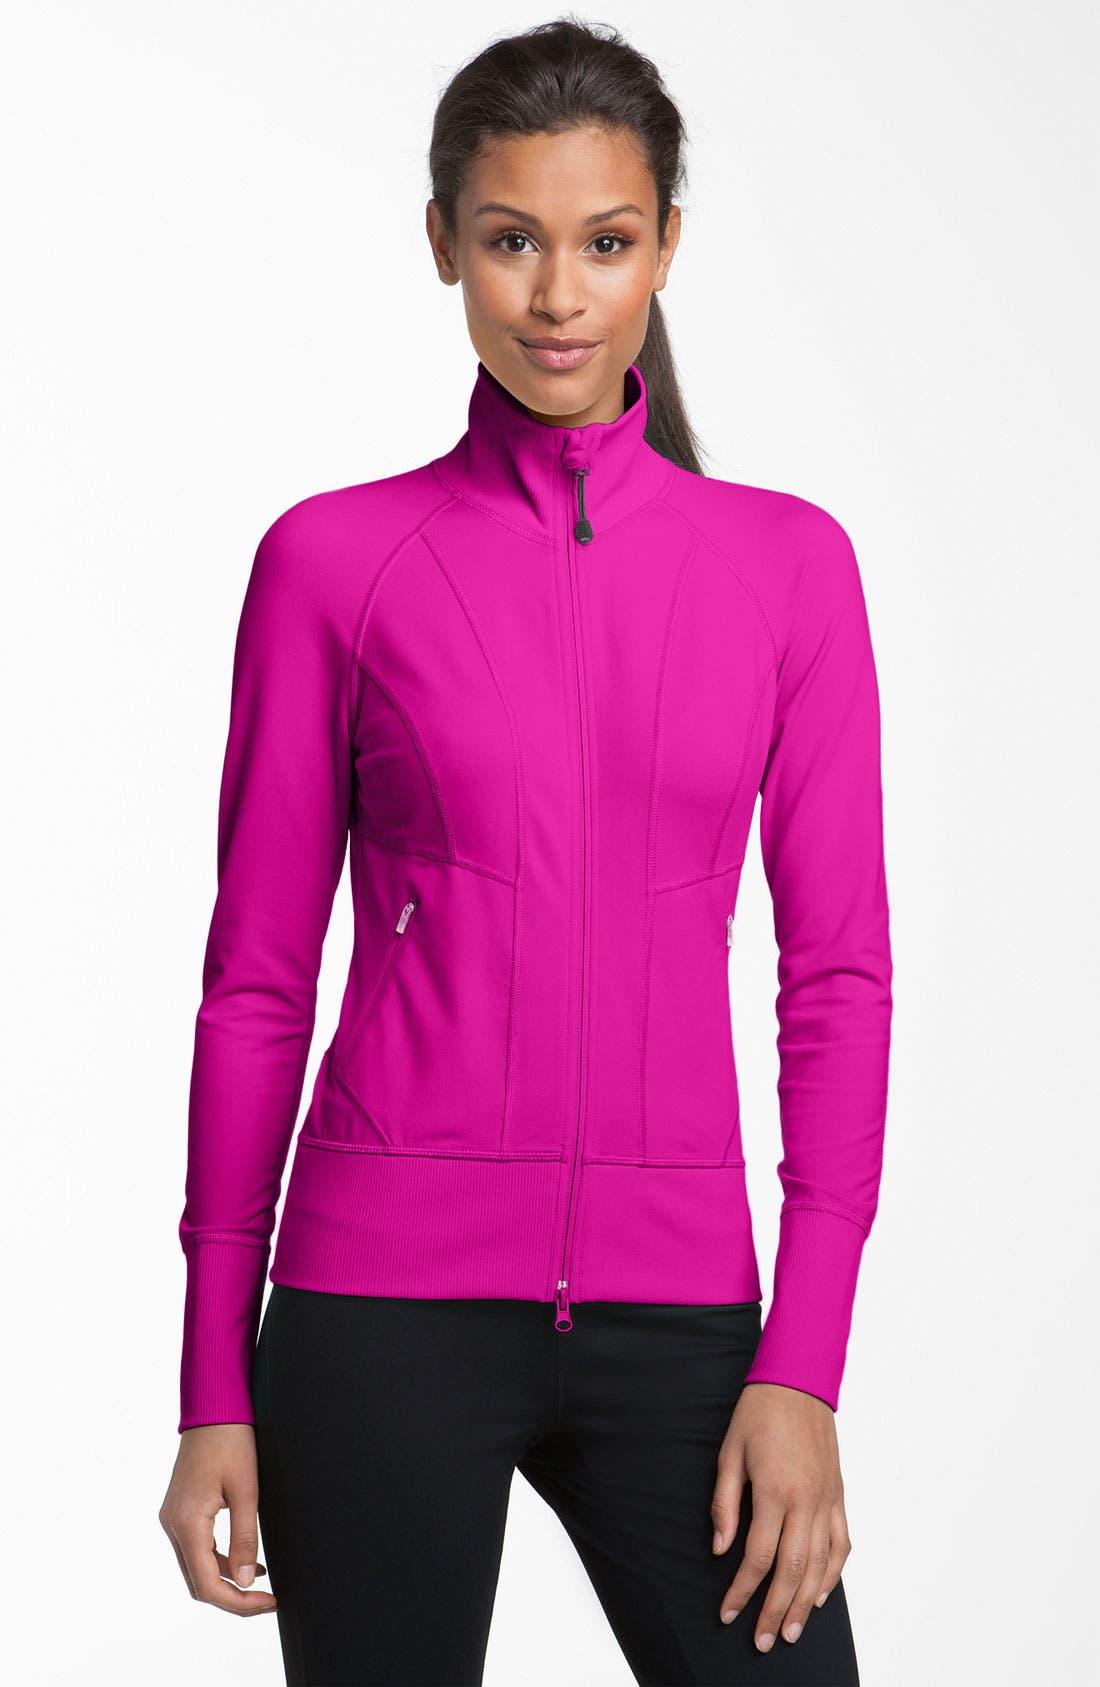 Main Image - Zella 'No. 1 Sport'  Jacket